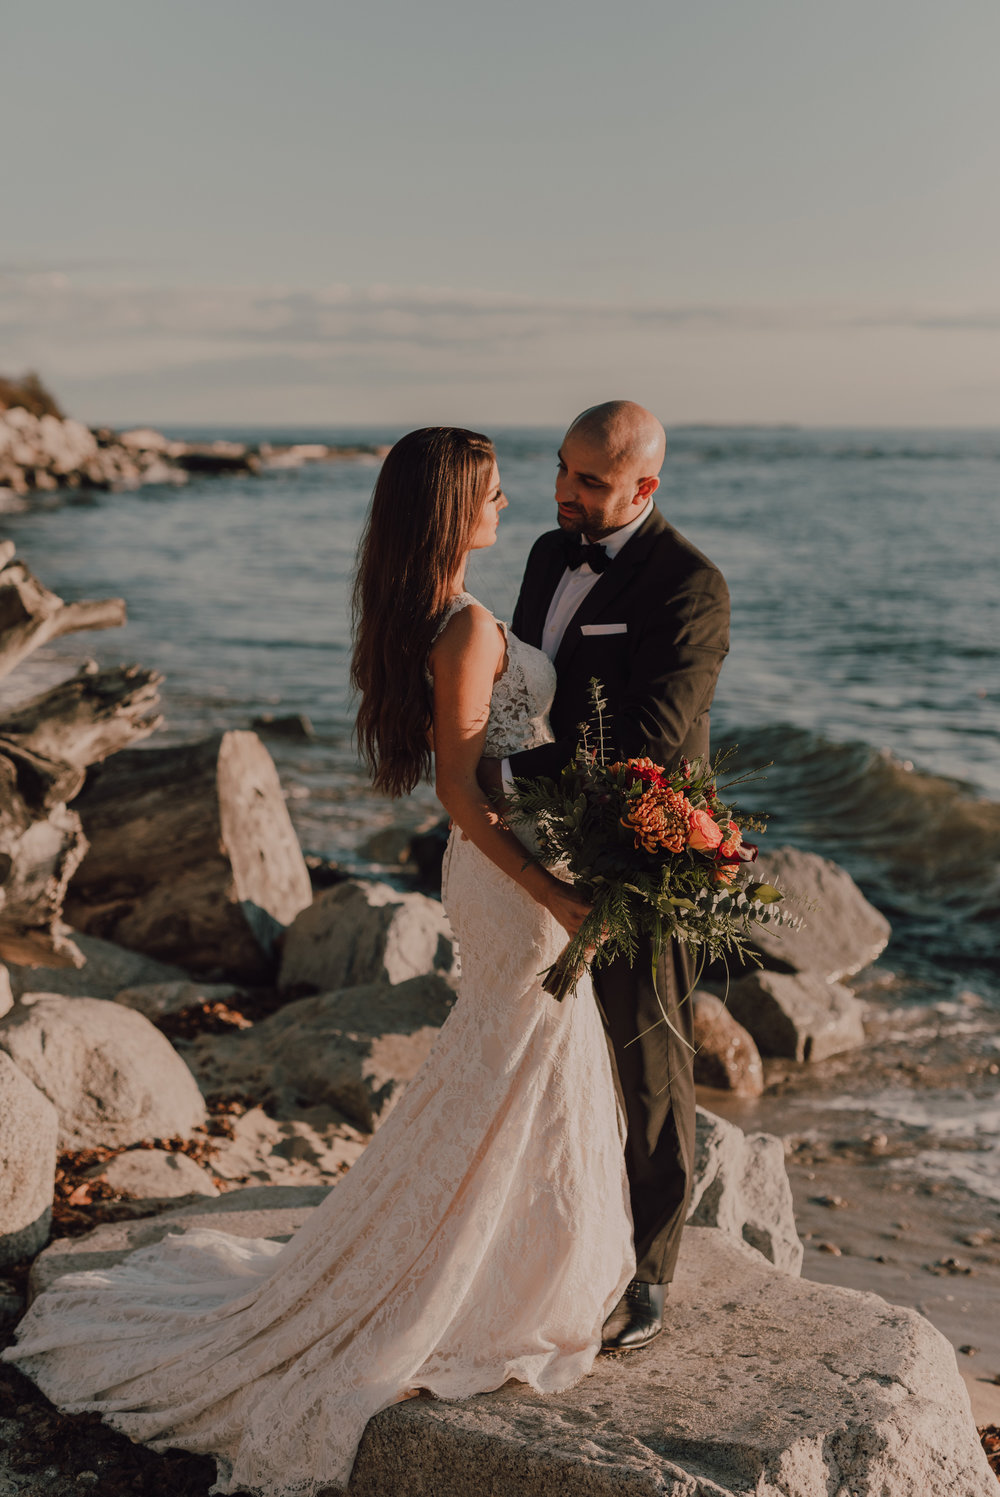 Day After Wedding Photos - Sunshine Coast Wedding Photos - Sunset Wedding Photos - Vancouver Wedding Photographer & Videographer - Sunshine Coast Wedding Photos - Sunshine Coast Wedding Photographer - Jennifer Picard Photography - 1A5A8469.jpg